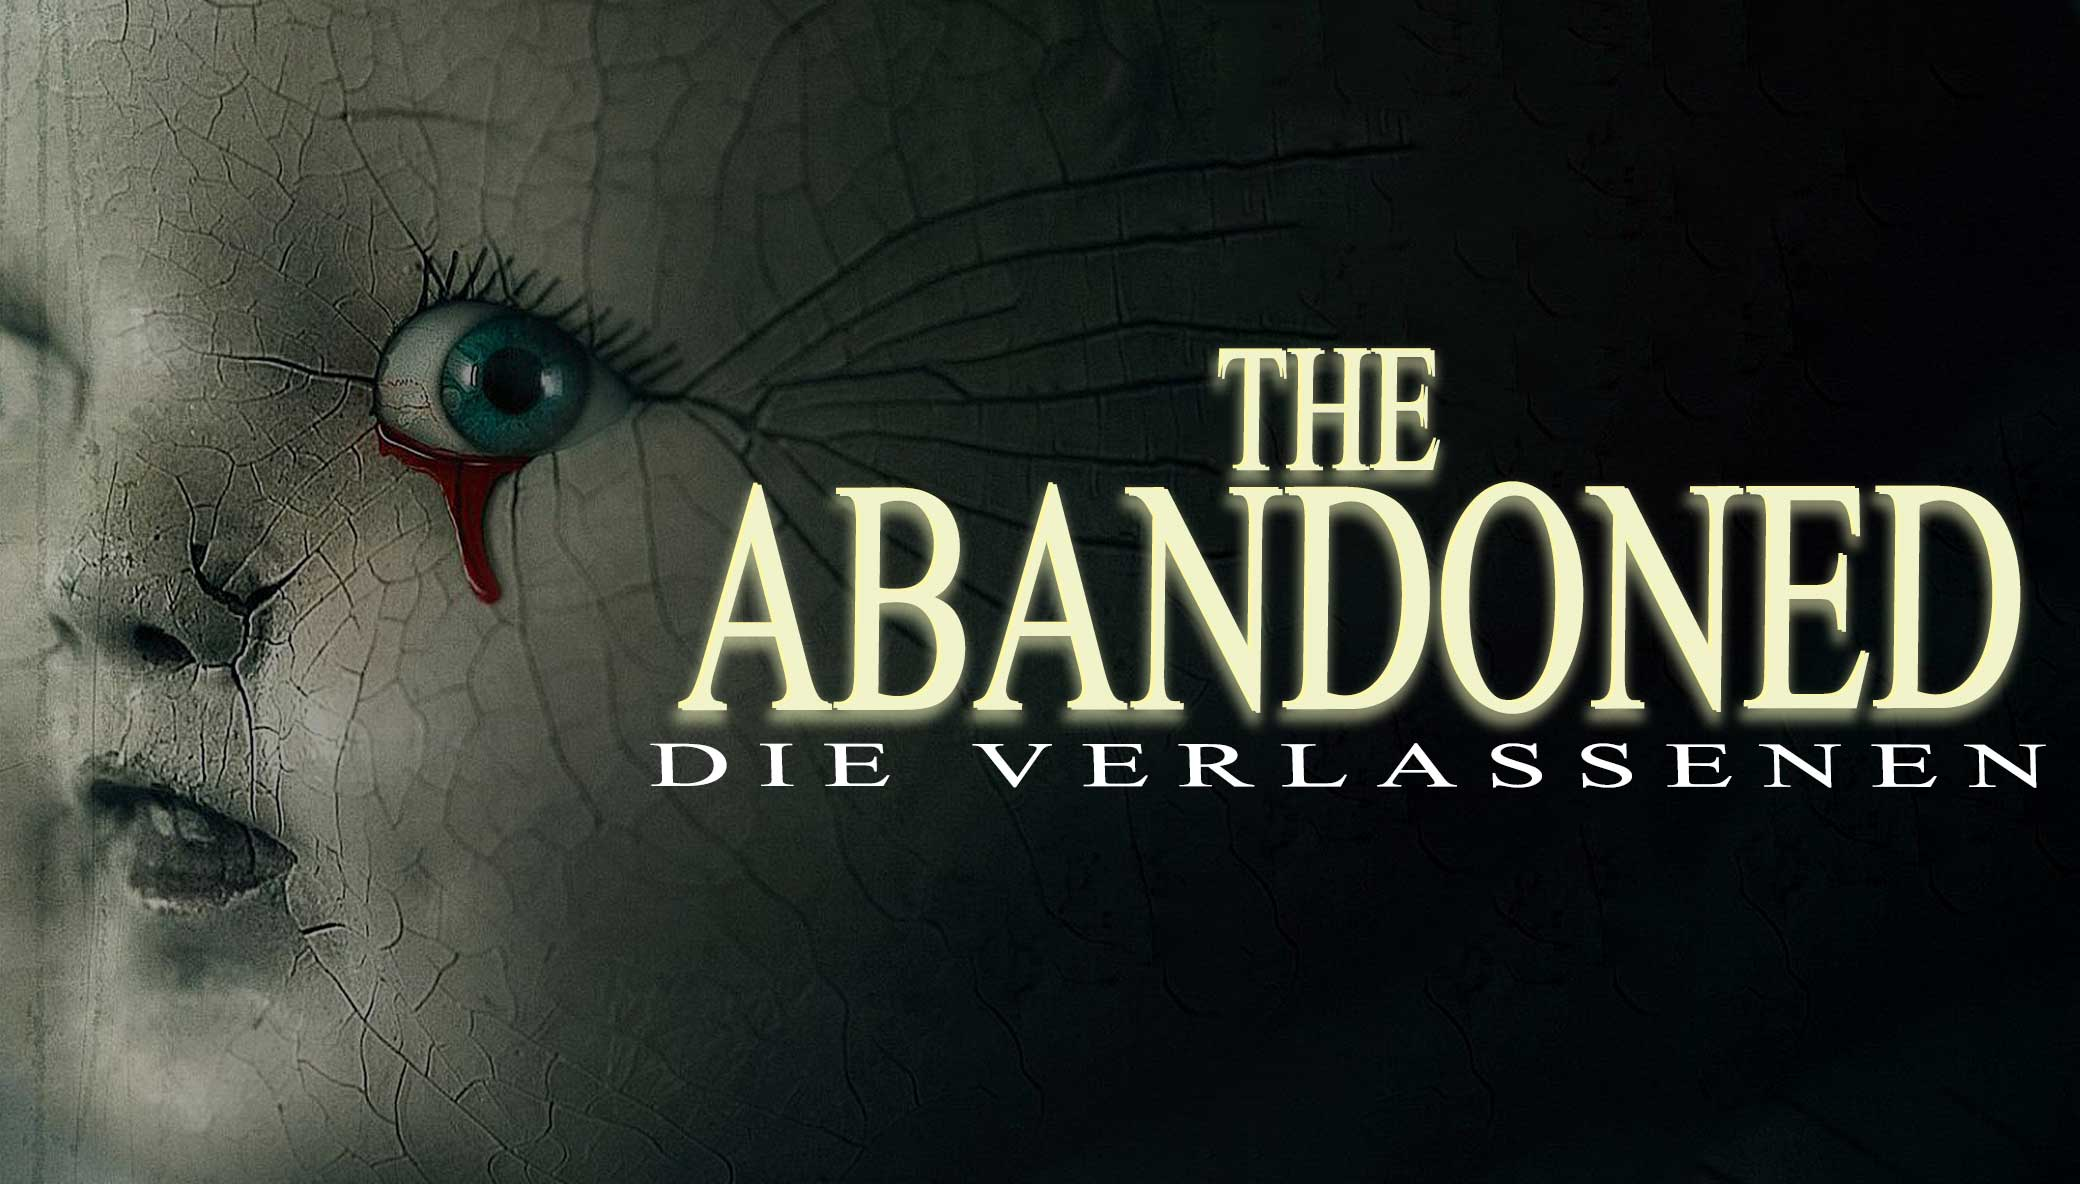 the-abandoned-die-verlassenen\header.jpg